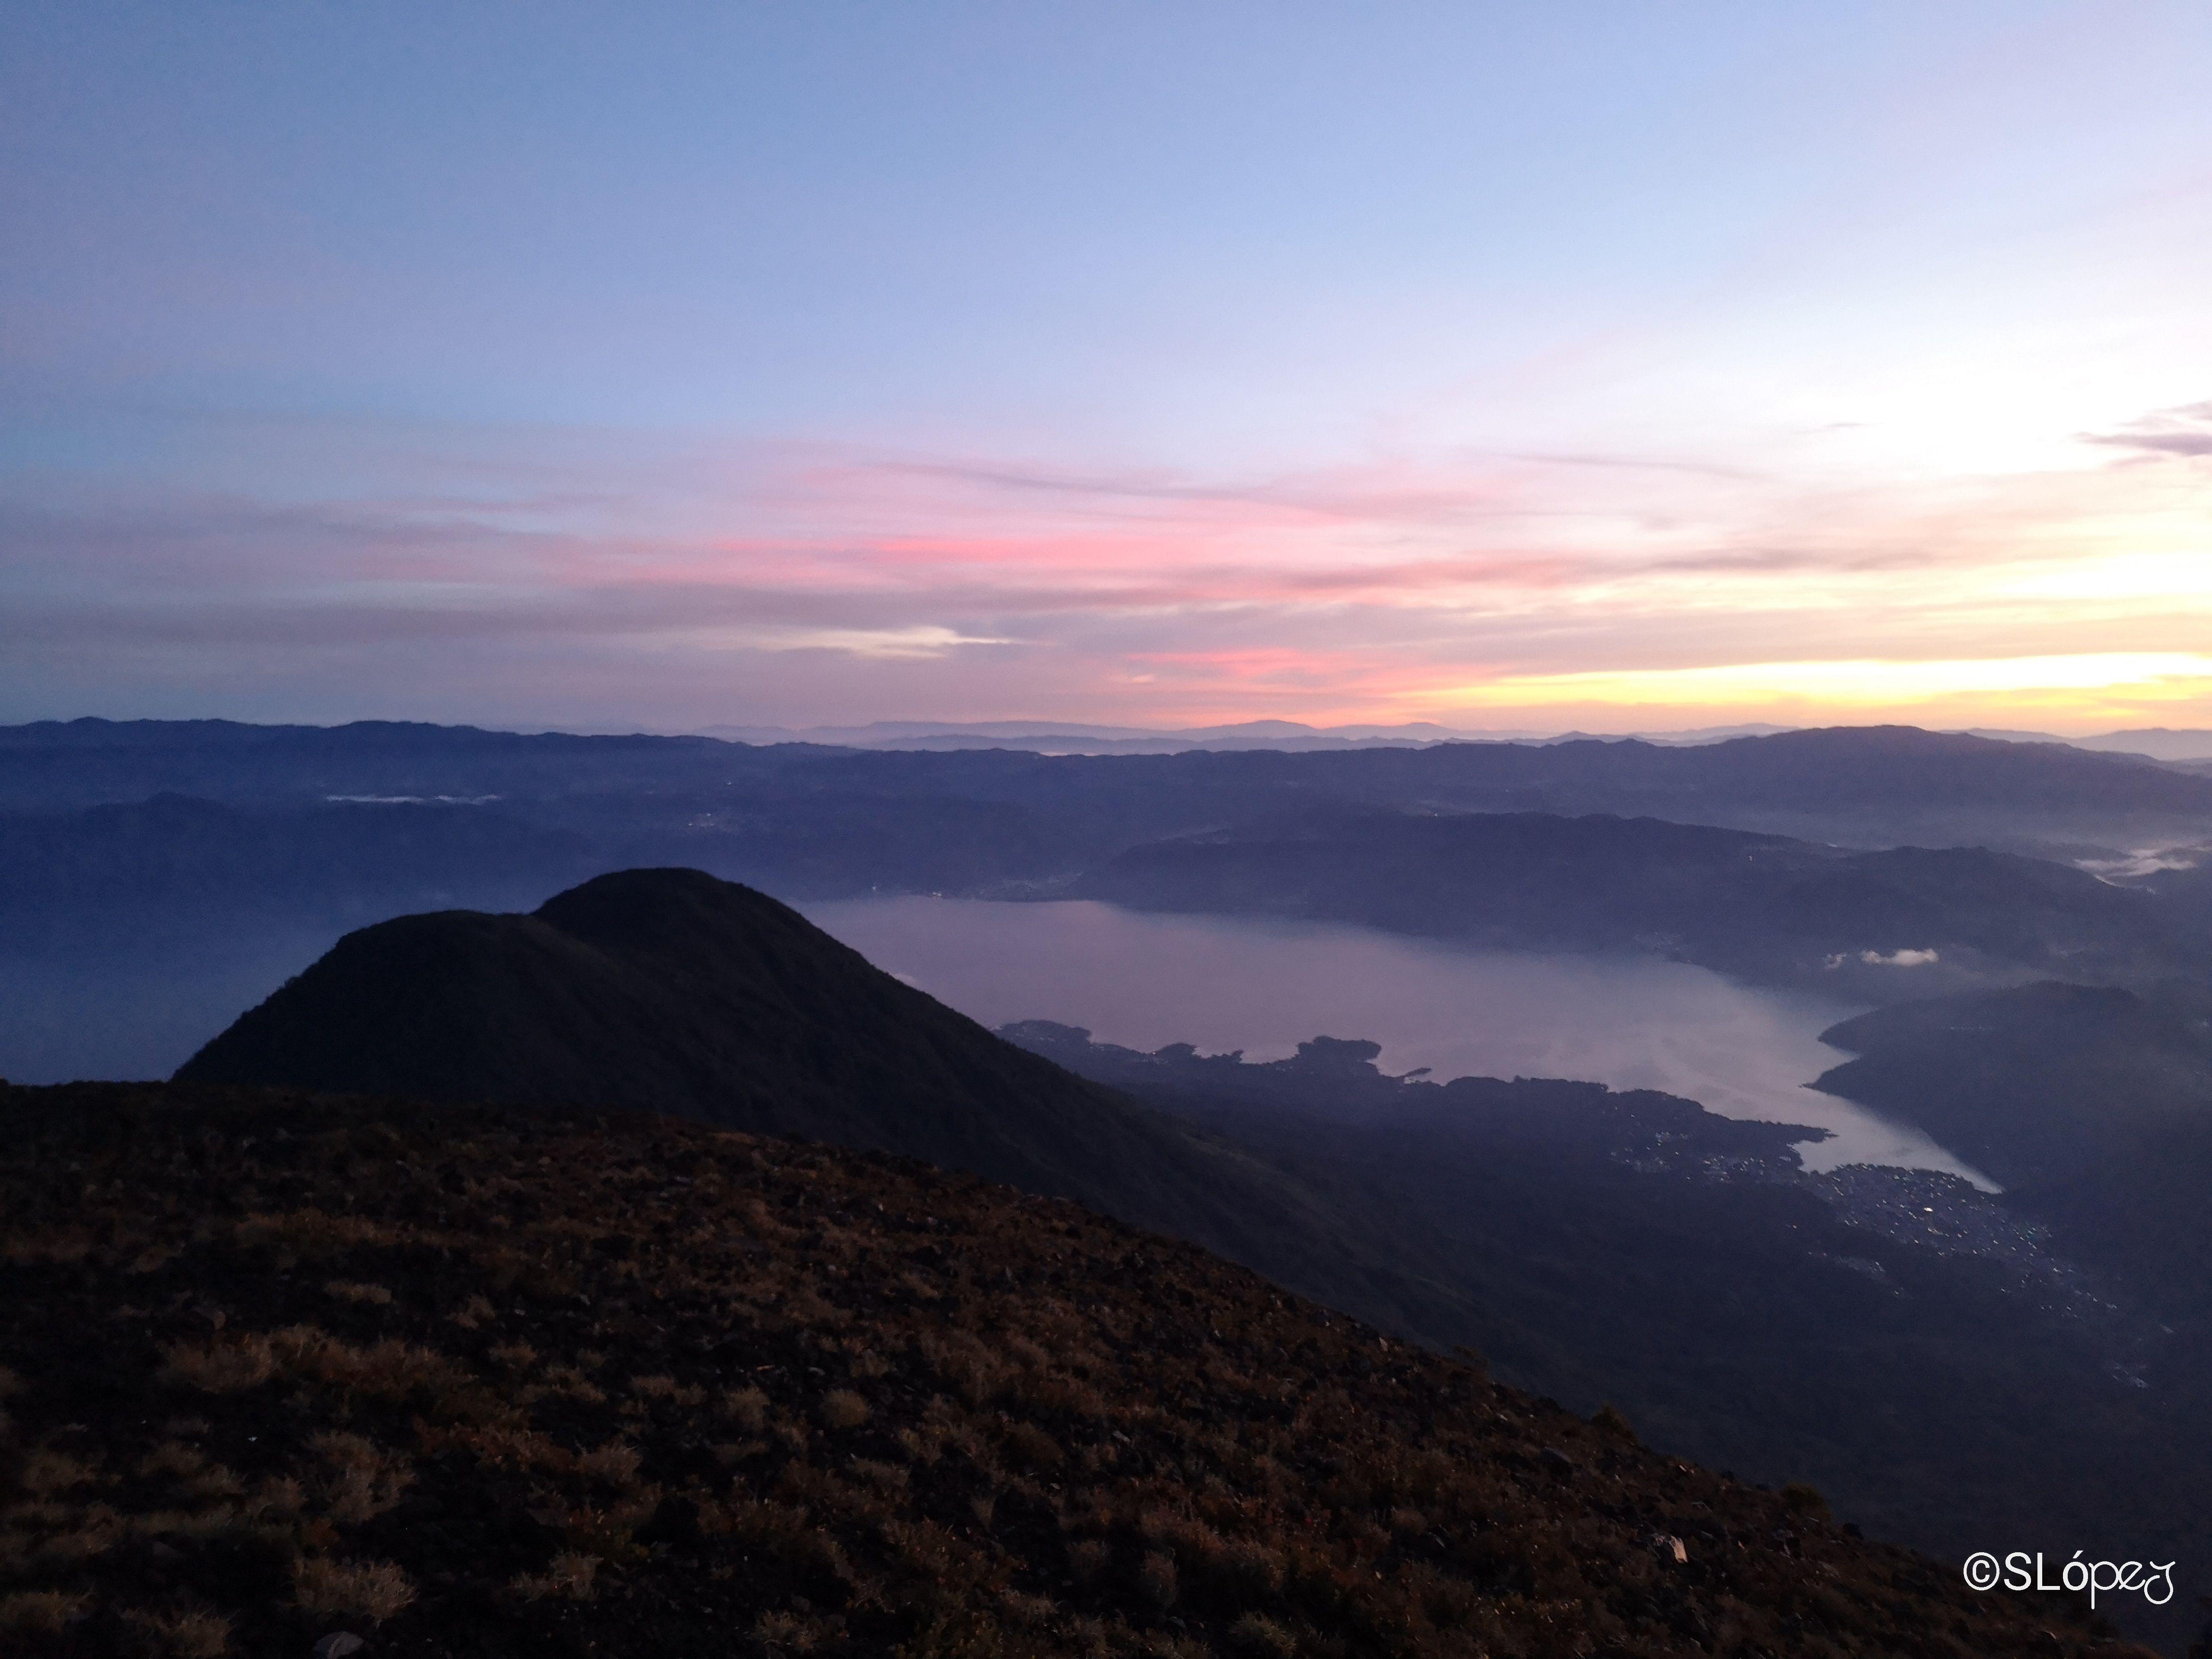 Volcán de Atitlán | Ascenso Nocturno